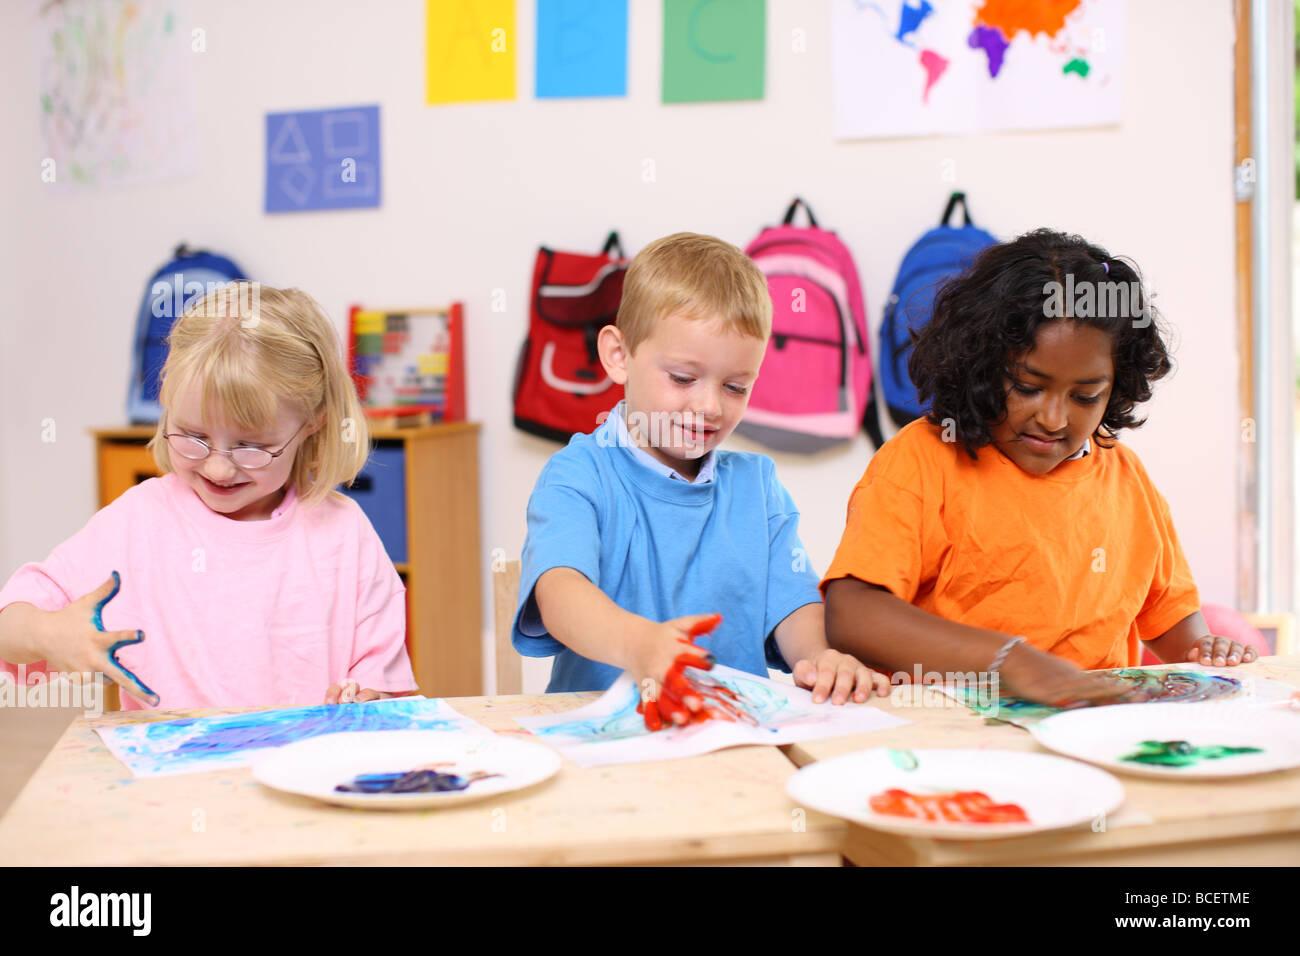 Preschool kids finger painting - Stock Image